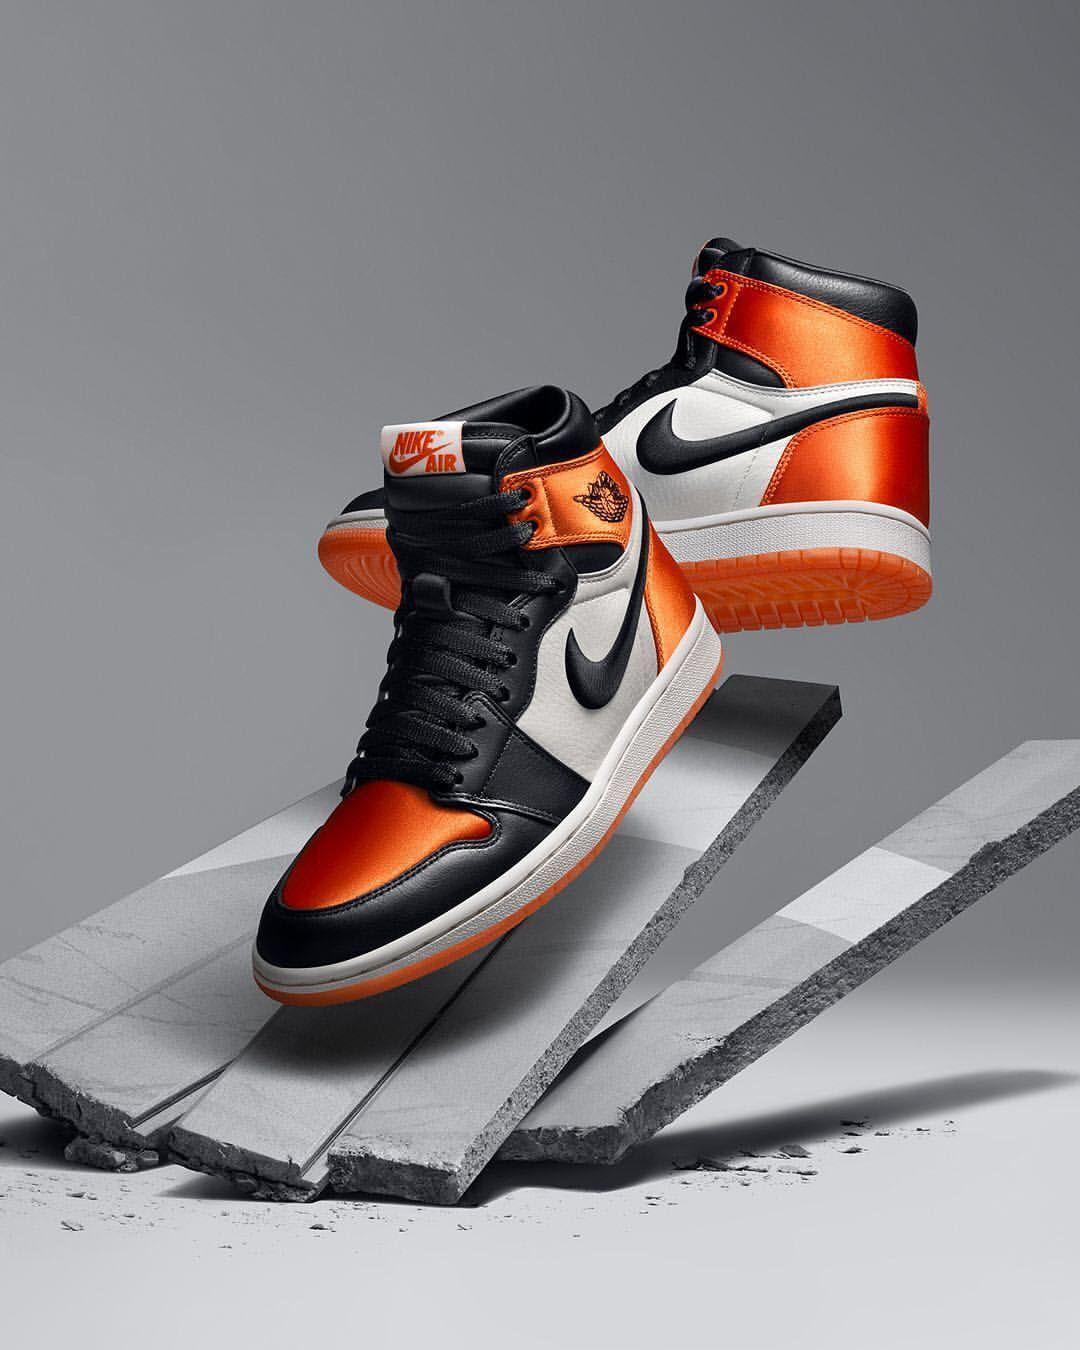 on sale c9620 61401 Nike Air Jordan 1  Satin Shattered Backboard